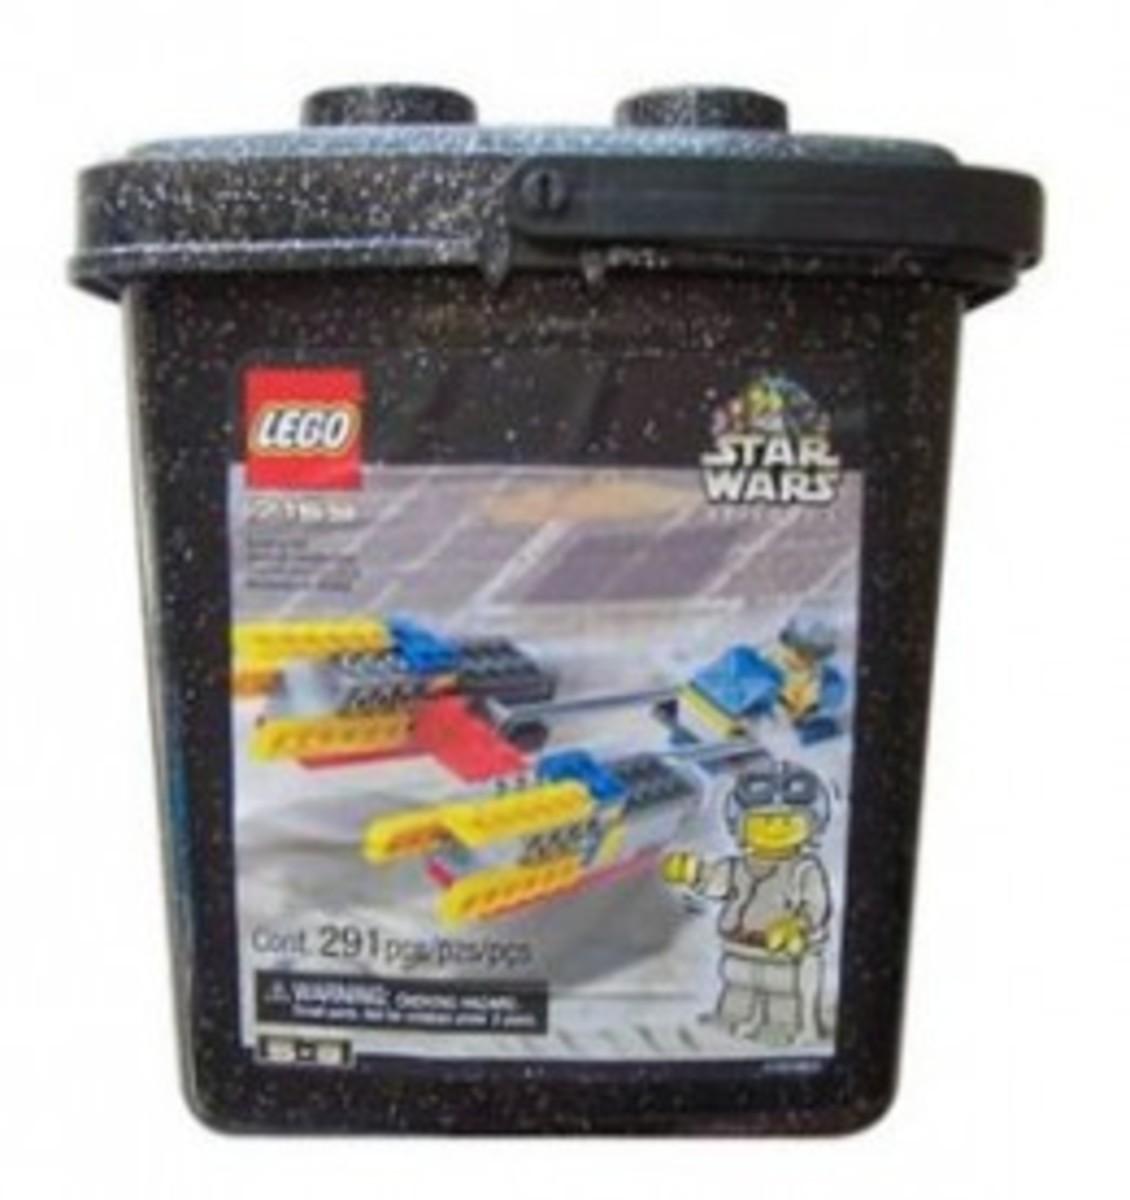 Lego Star Wars Podracer Bucket 7159